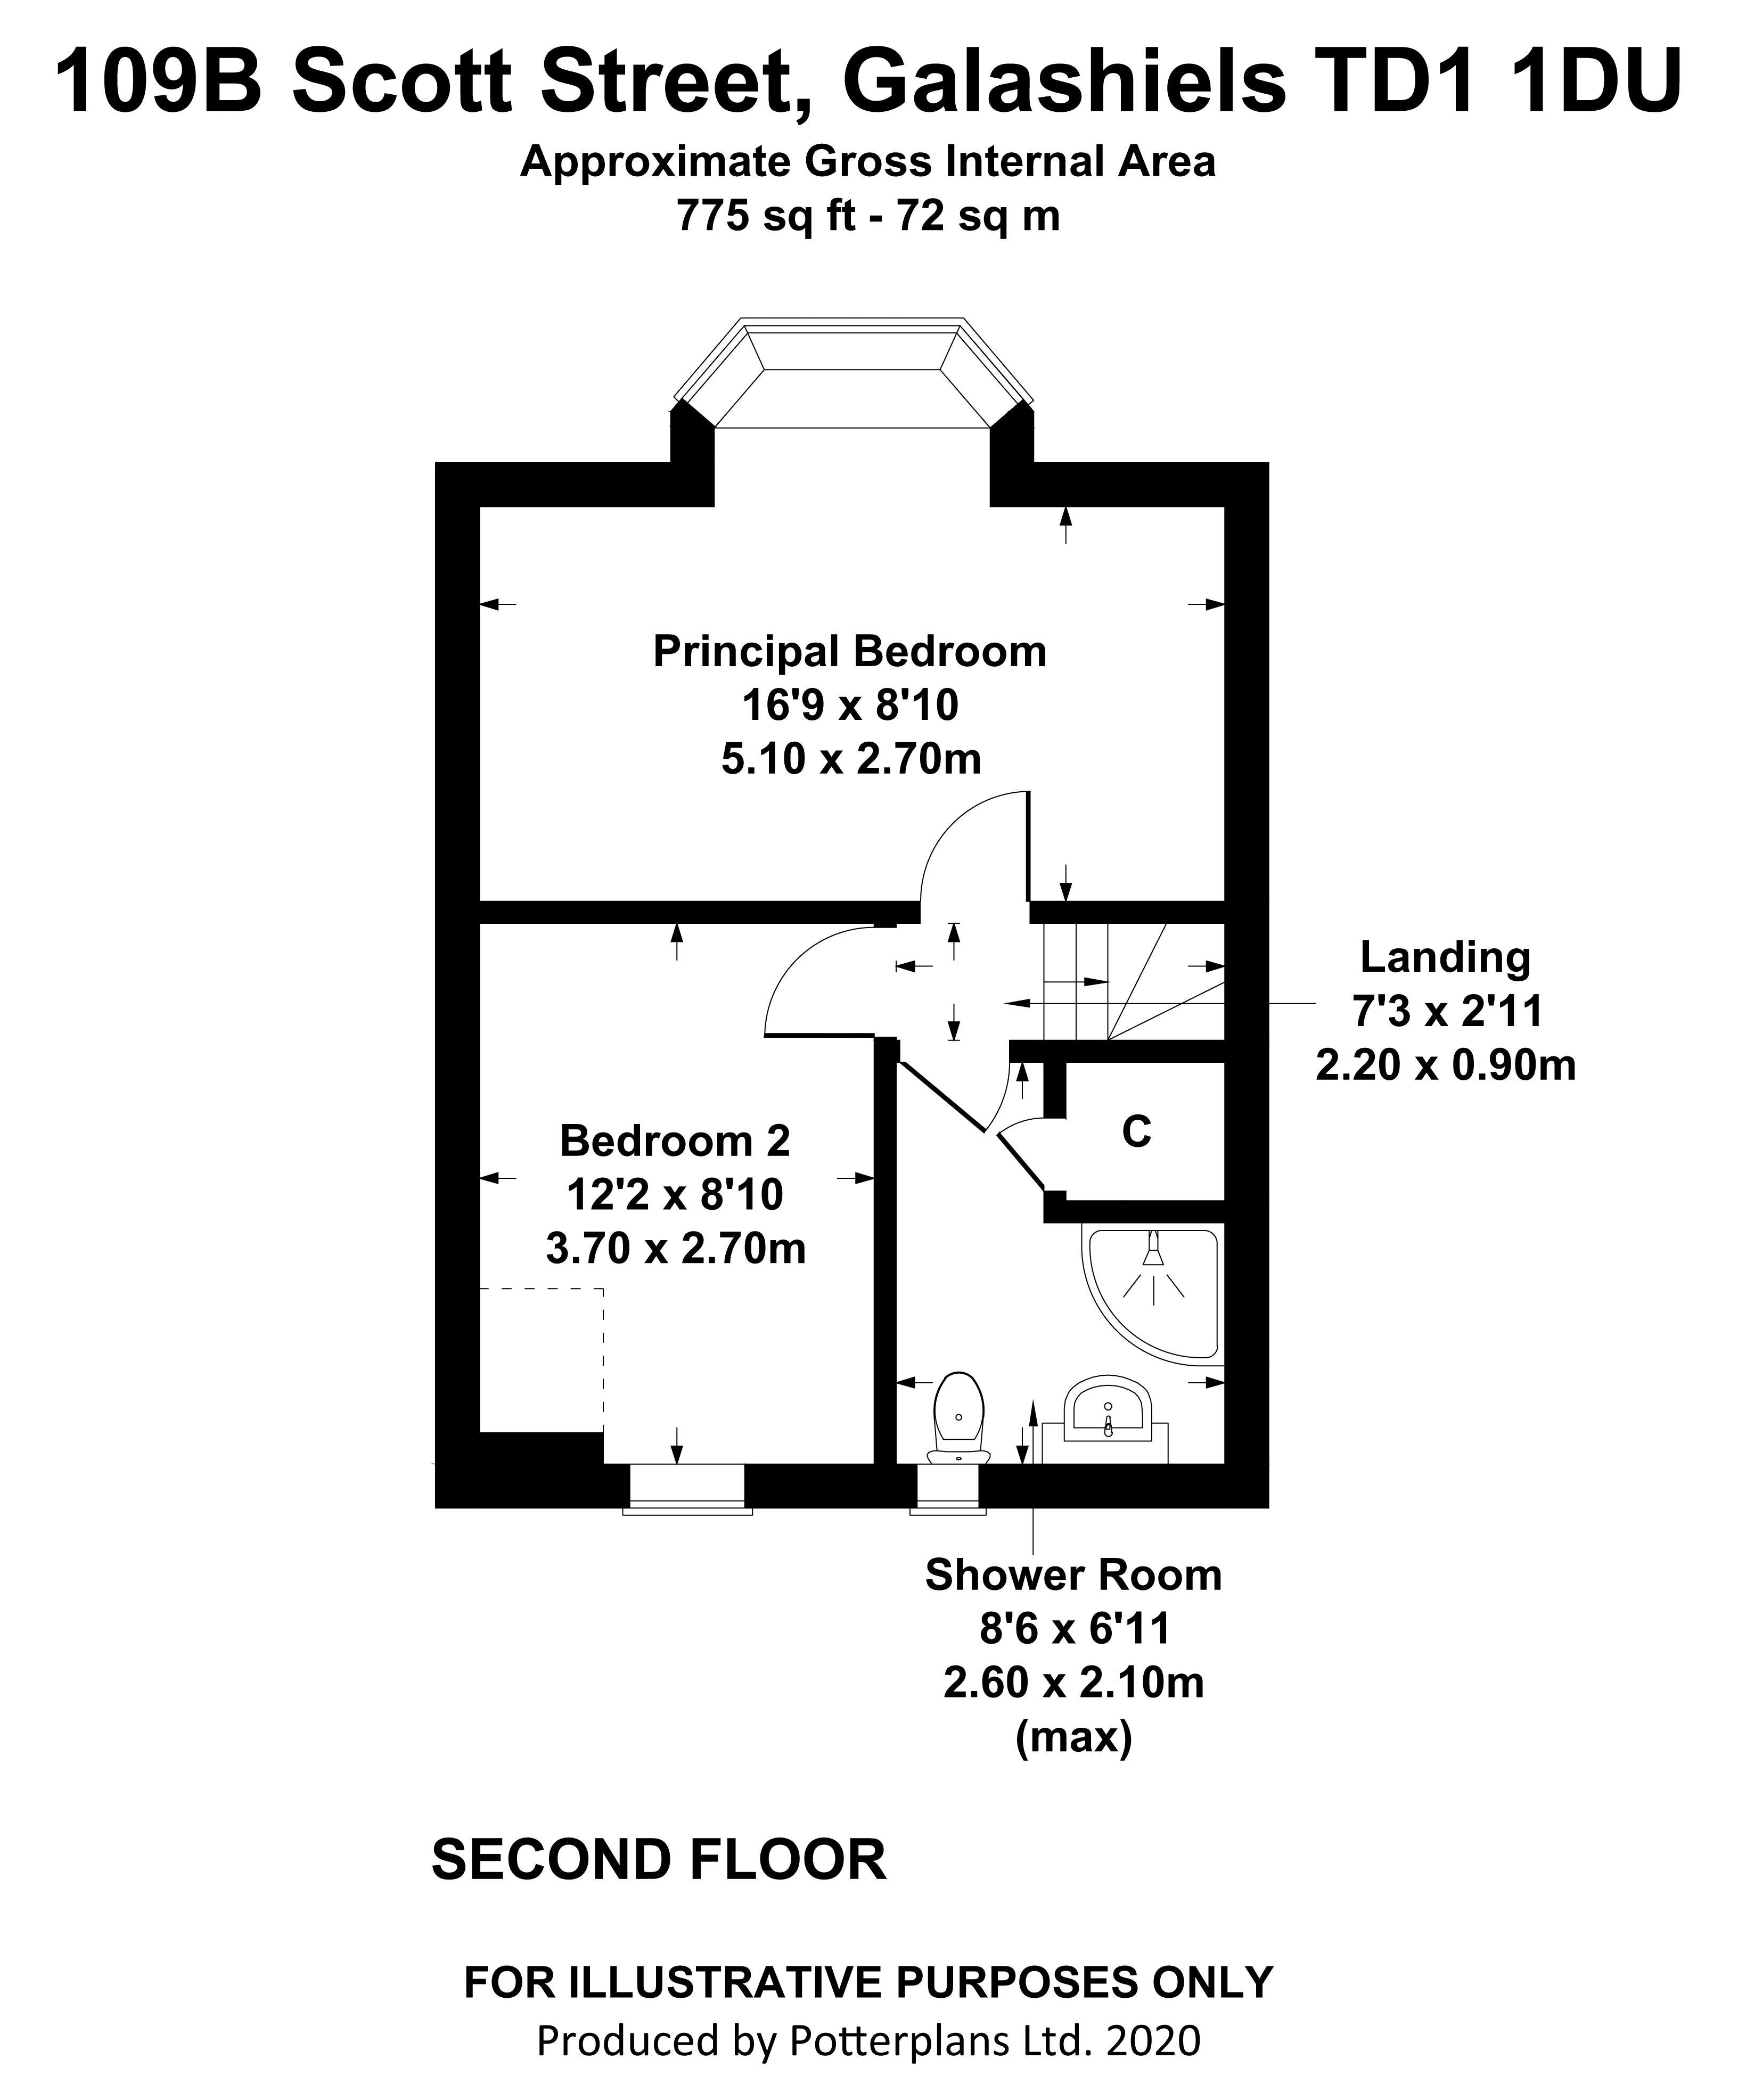 109B Scott Street Second Floor